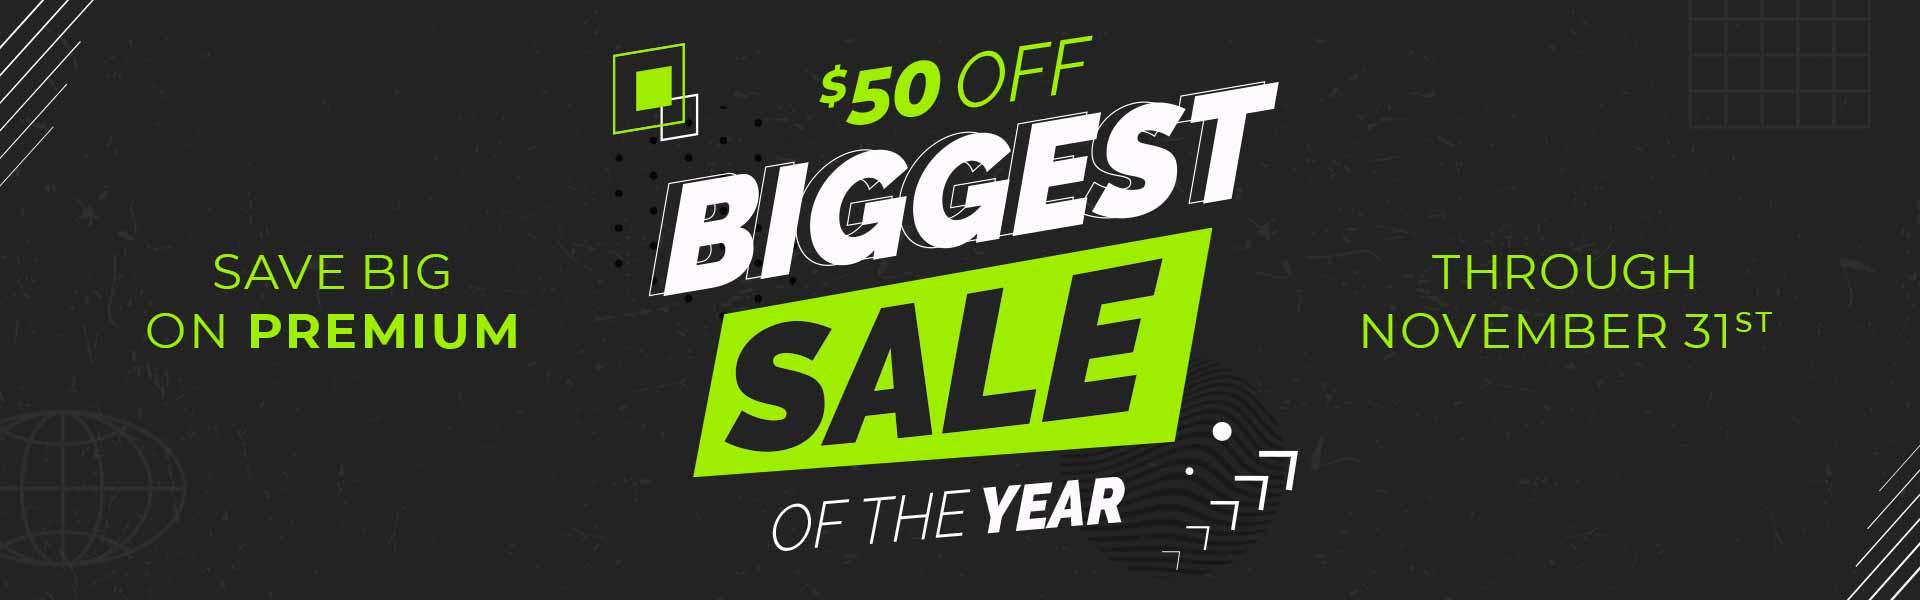 $50 Off Biggest Sale